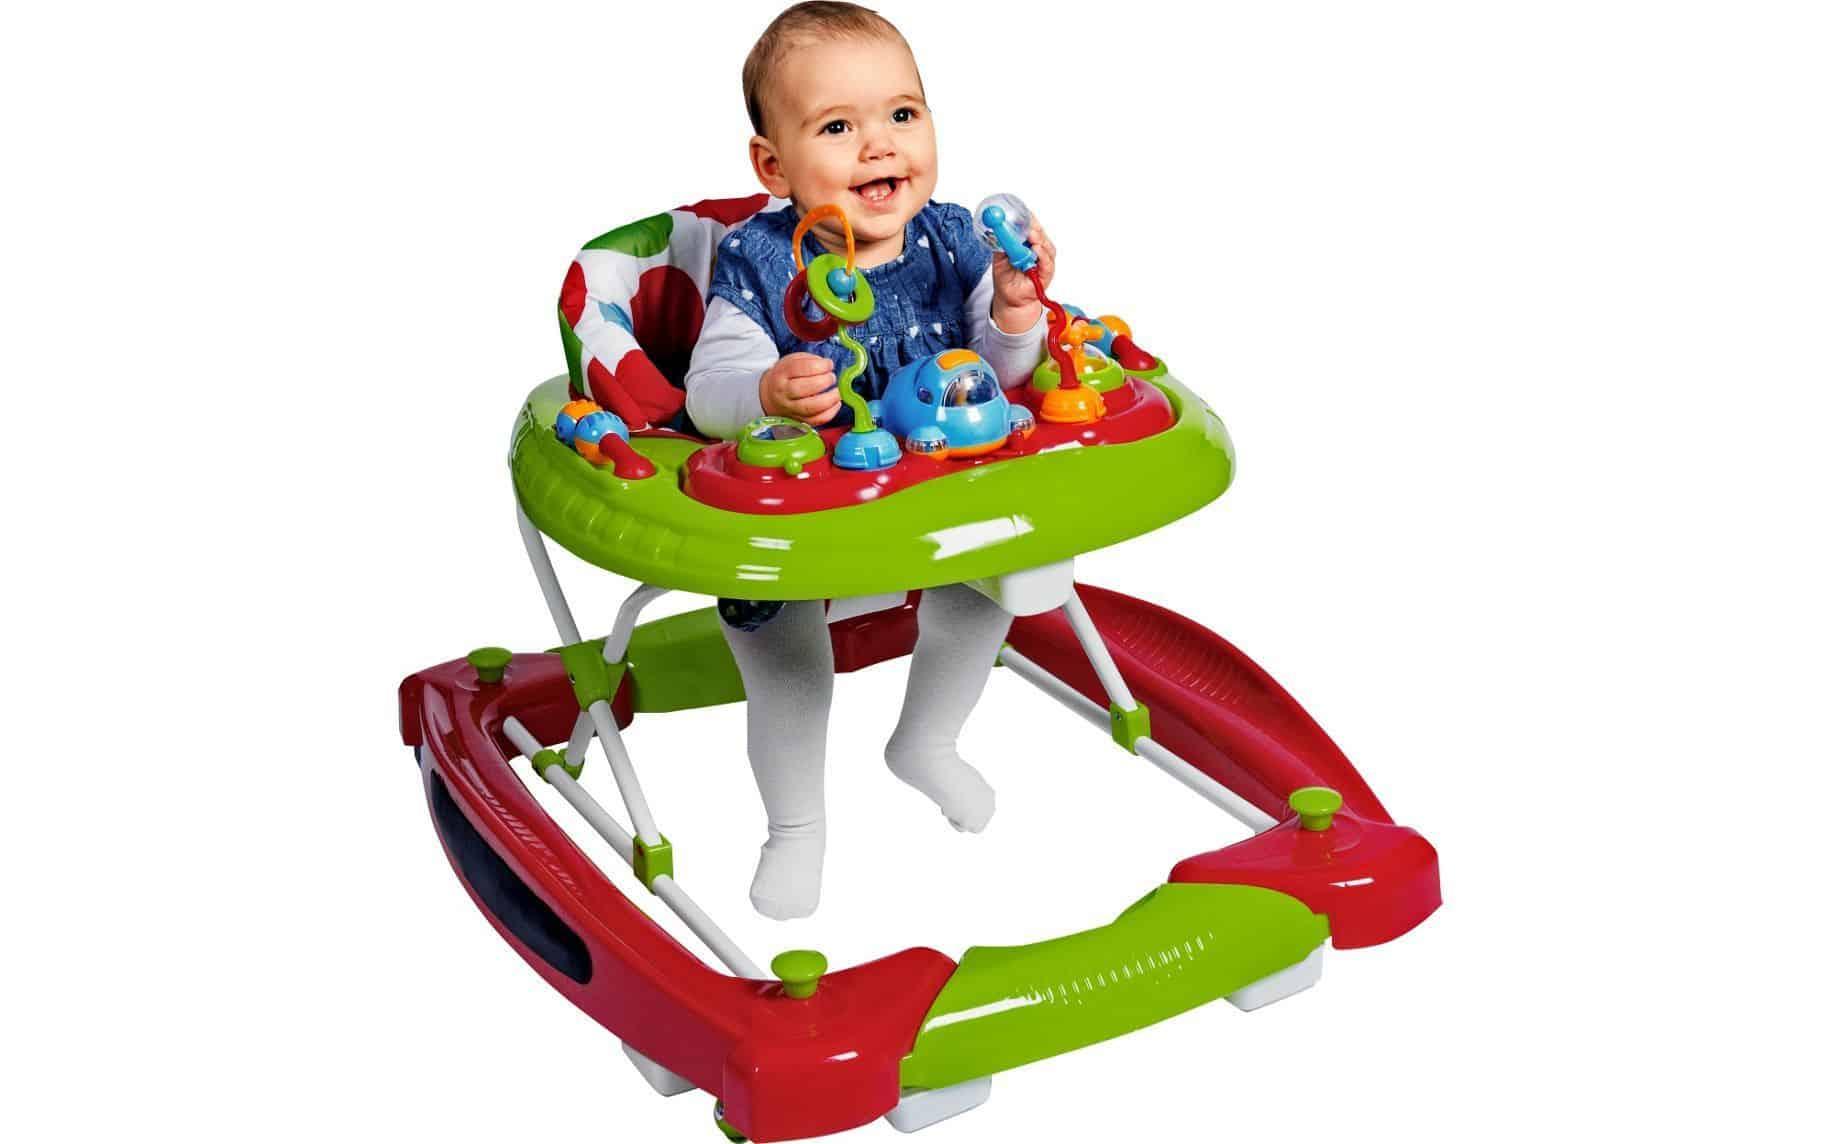 redkite-twist-spot-babywalking